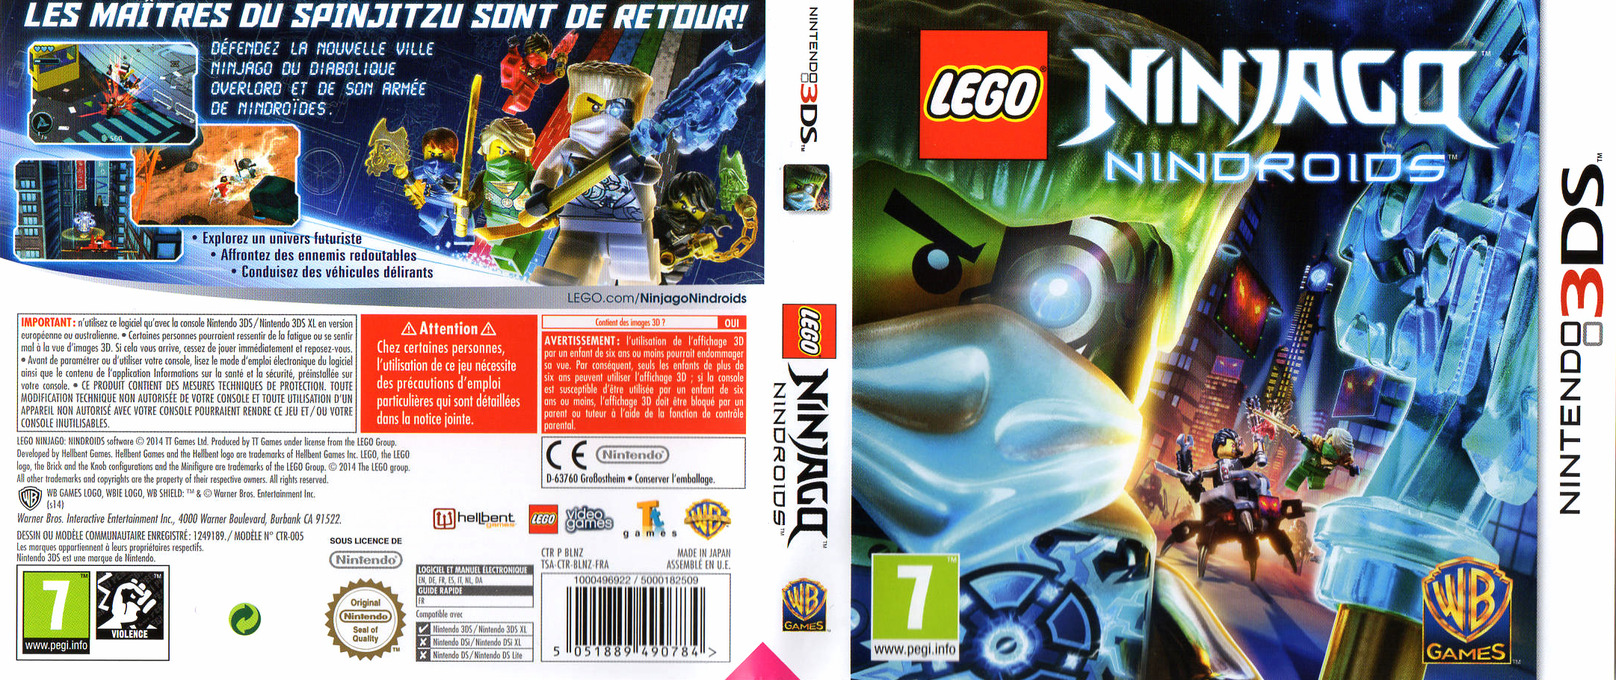 LEGO Ninjago - Nindroids 3DS coverfullHQ (BLNZ)